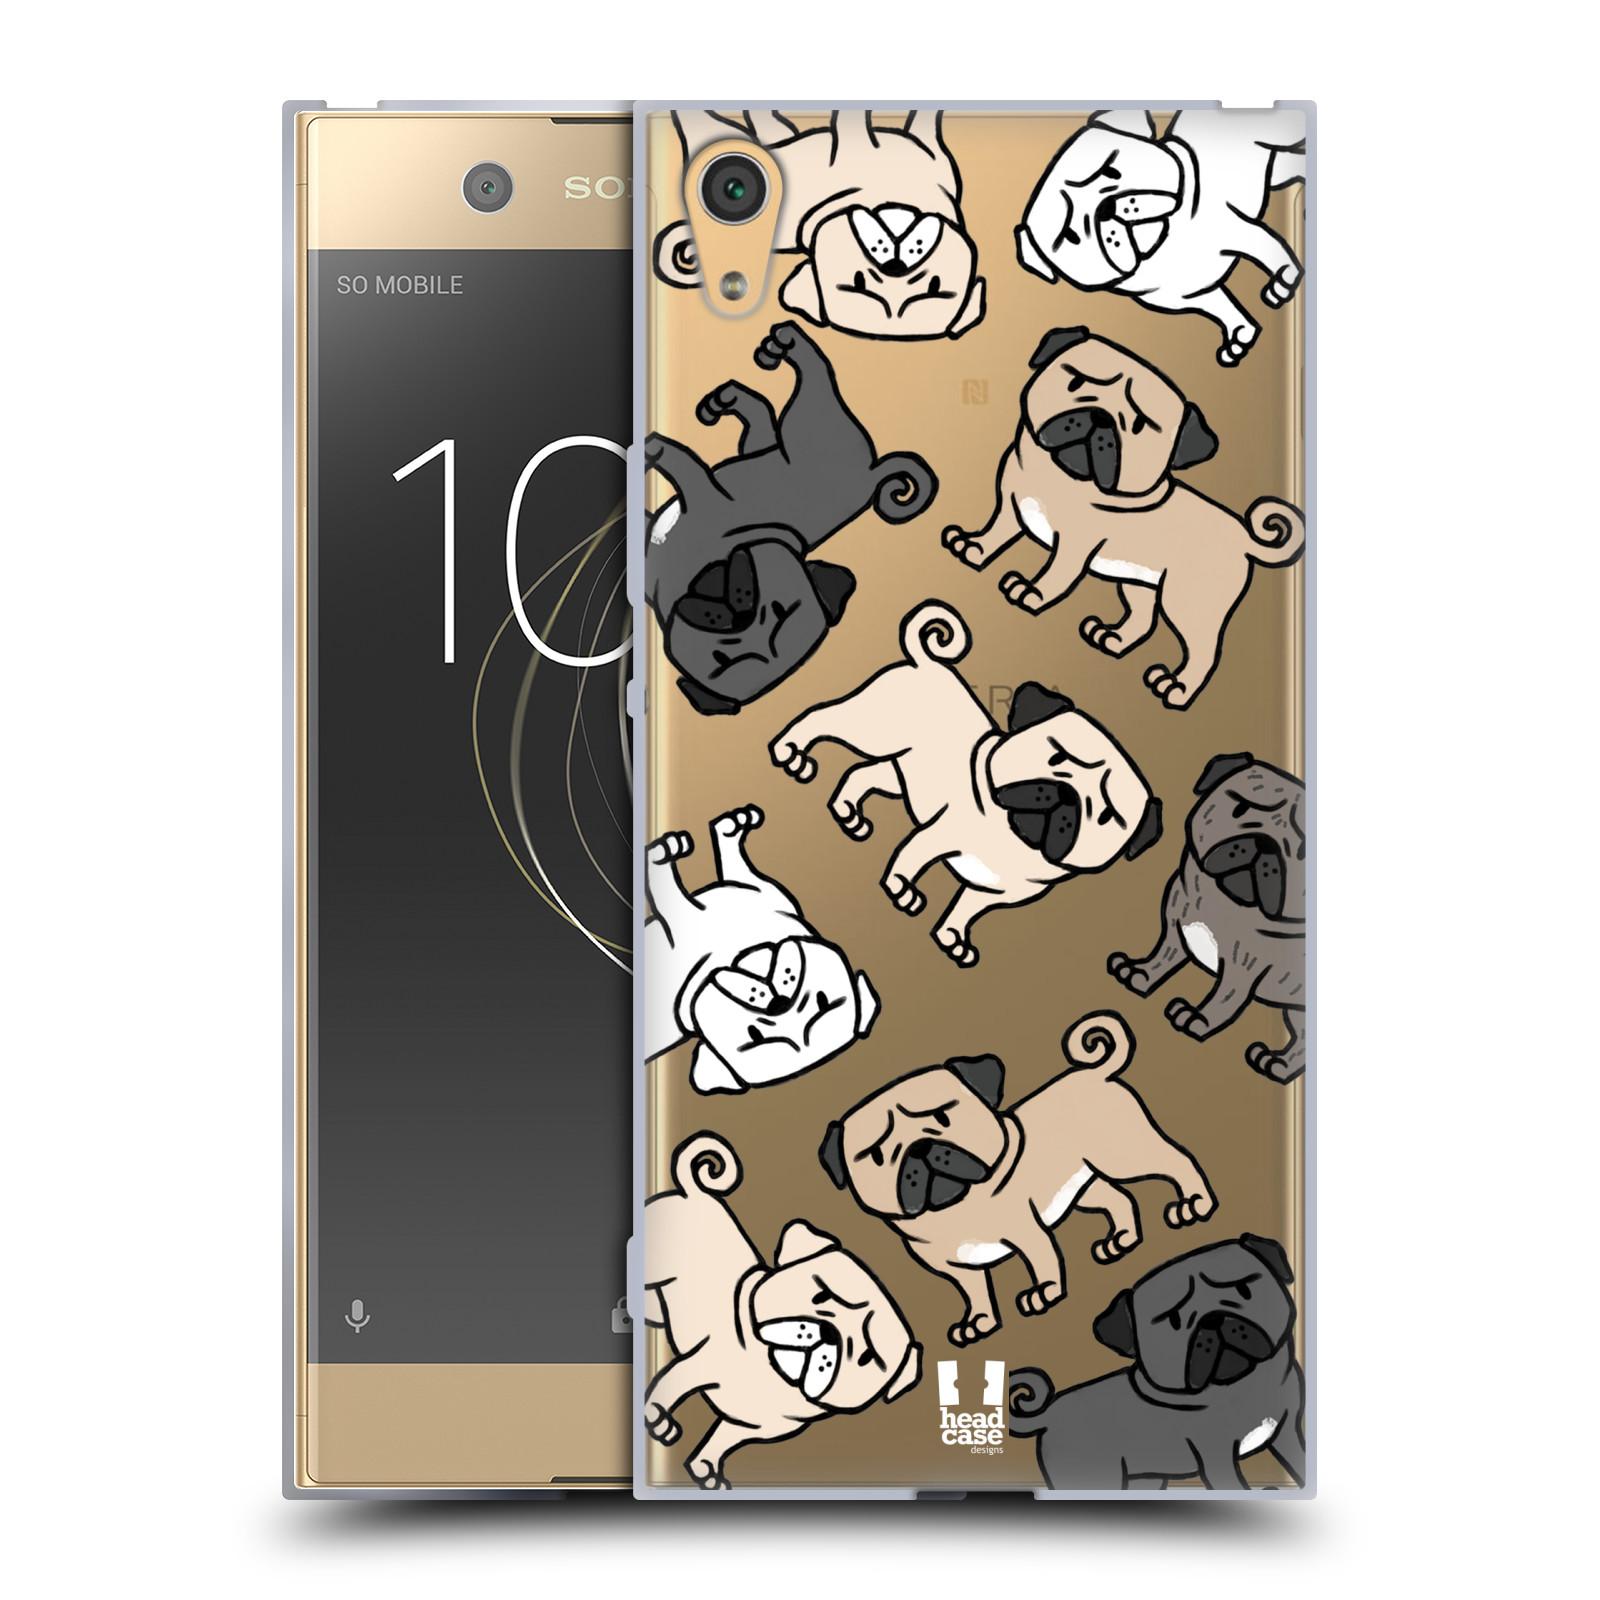 HEAD CASE silikonový obal na mobil Sony Xperia XA1 ULTRA pejsek Pug Mopsík